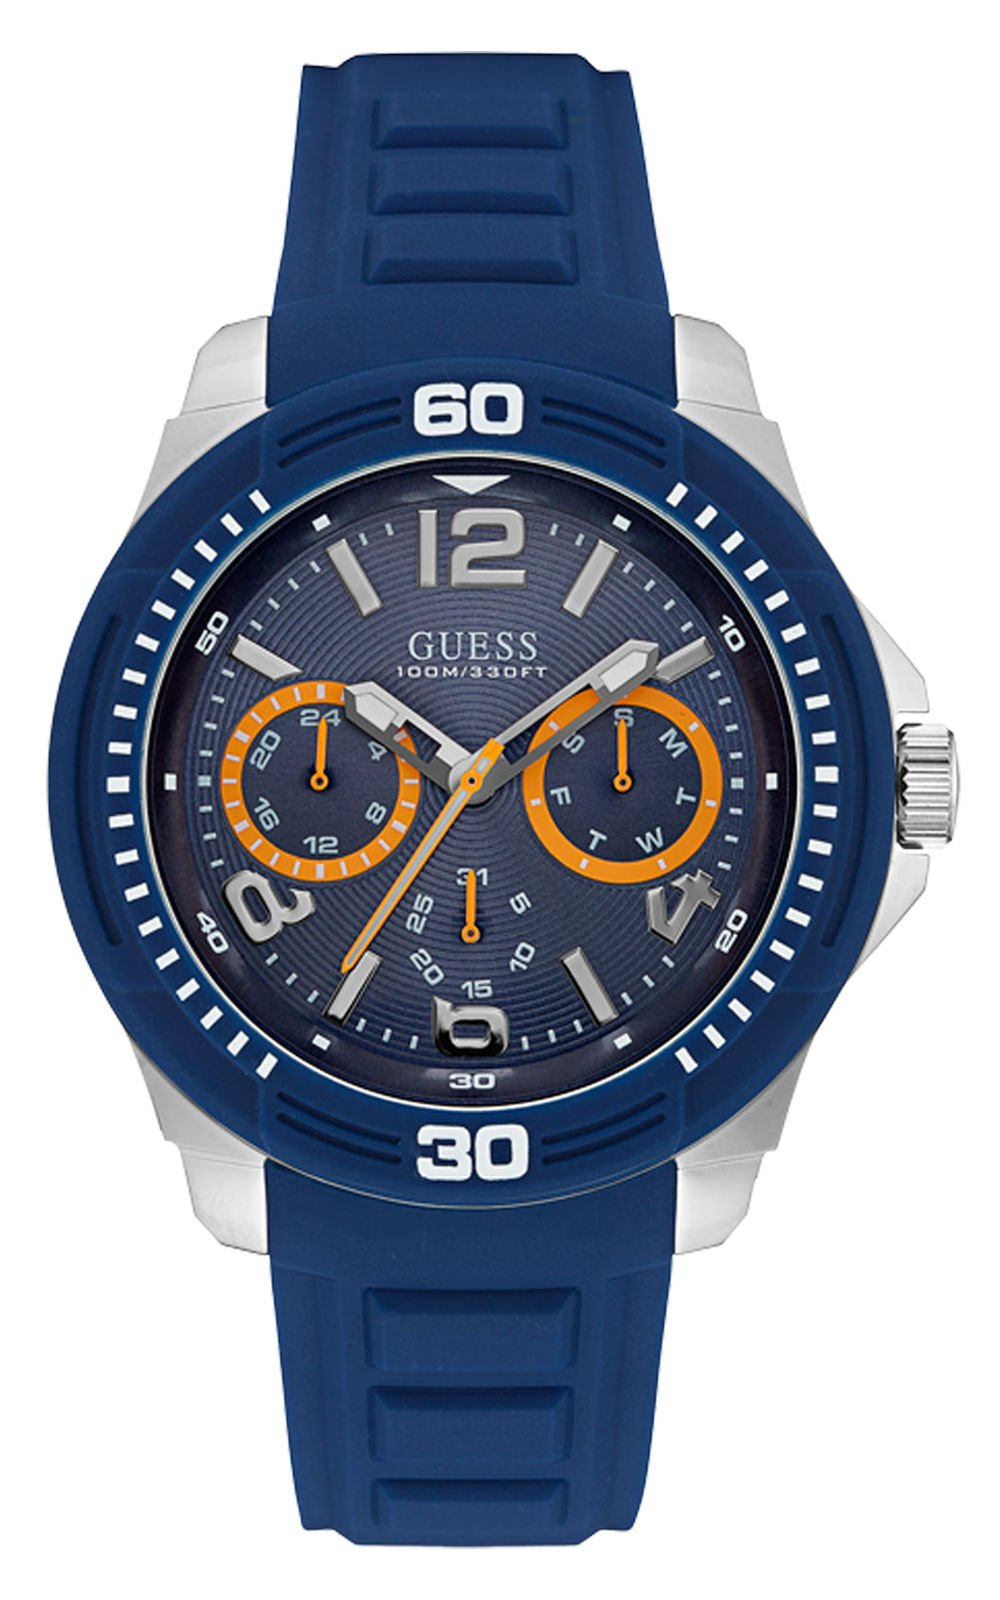 GUESS W0967G2 Ανδρικό Ρολόι Quartz Multi-Function